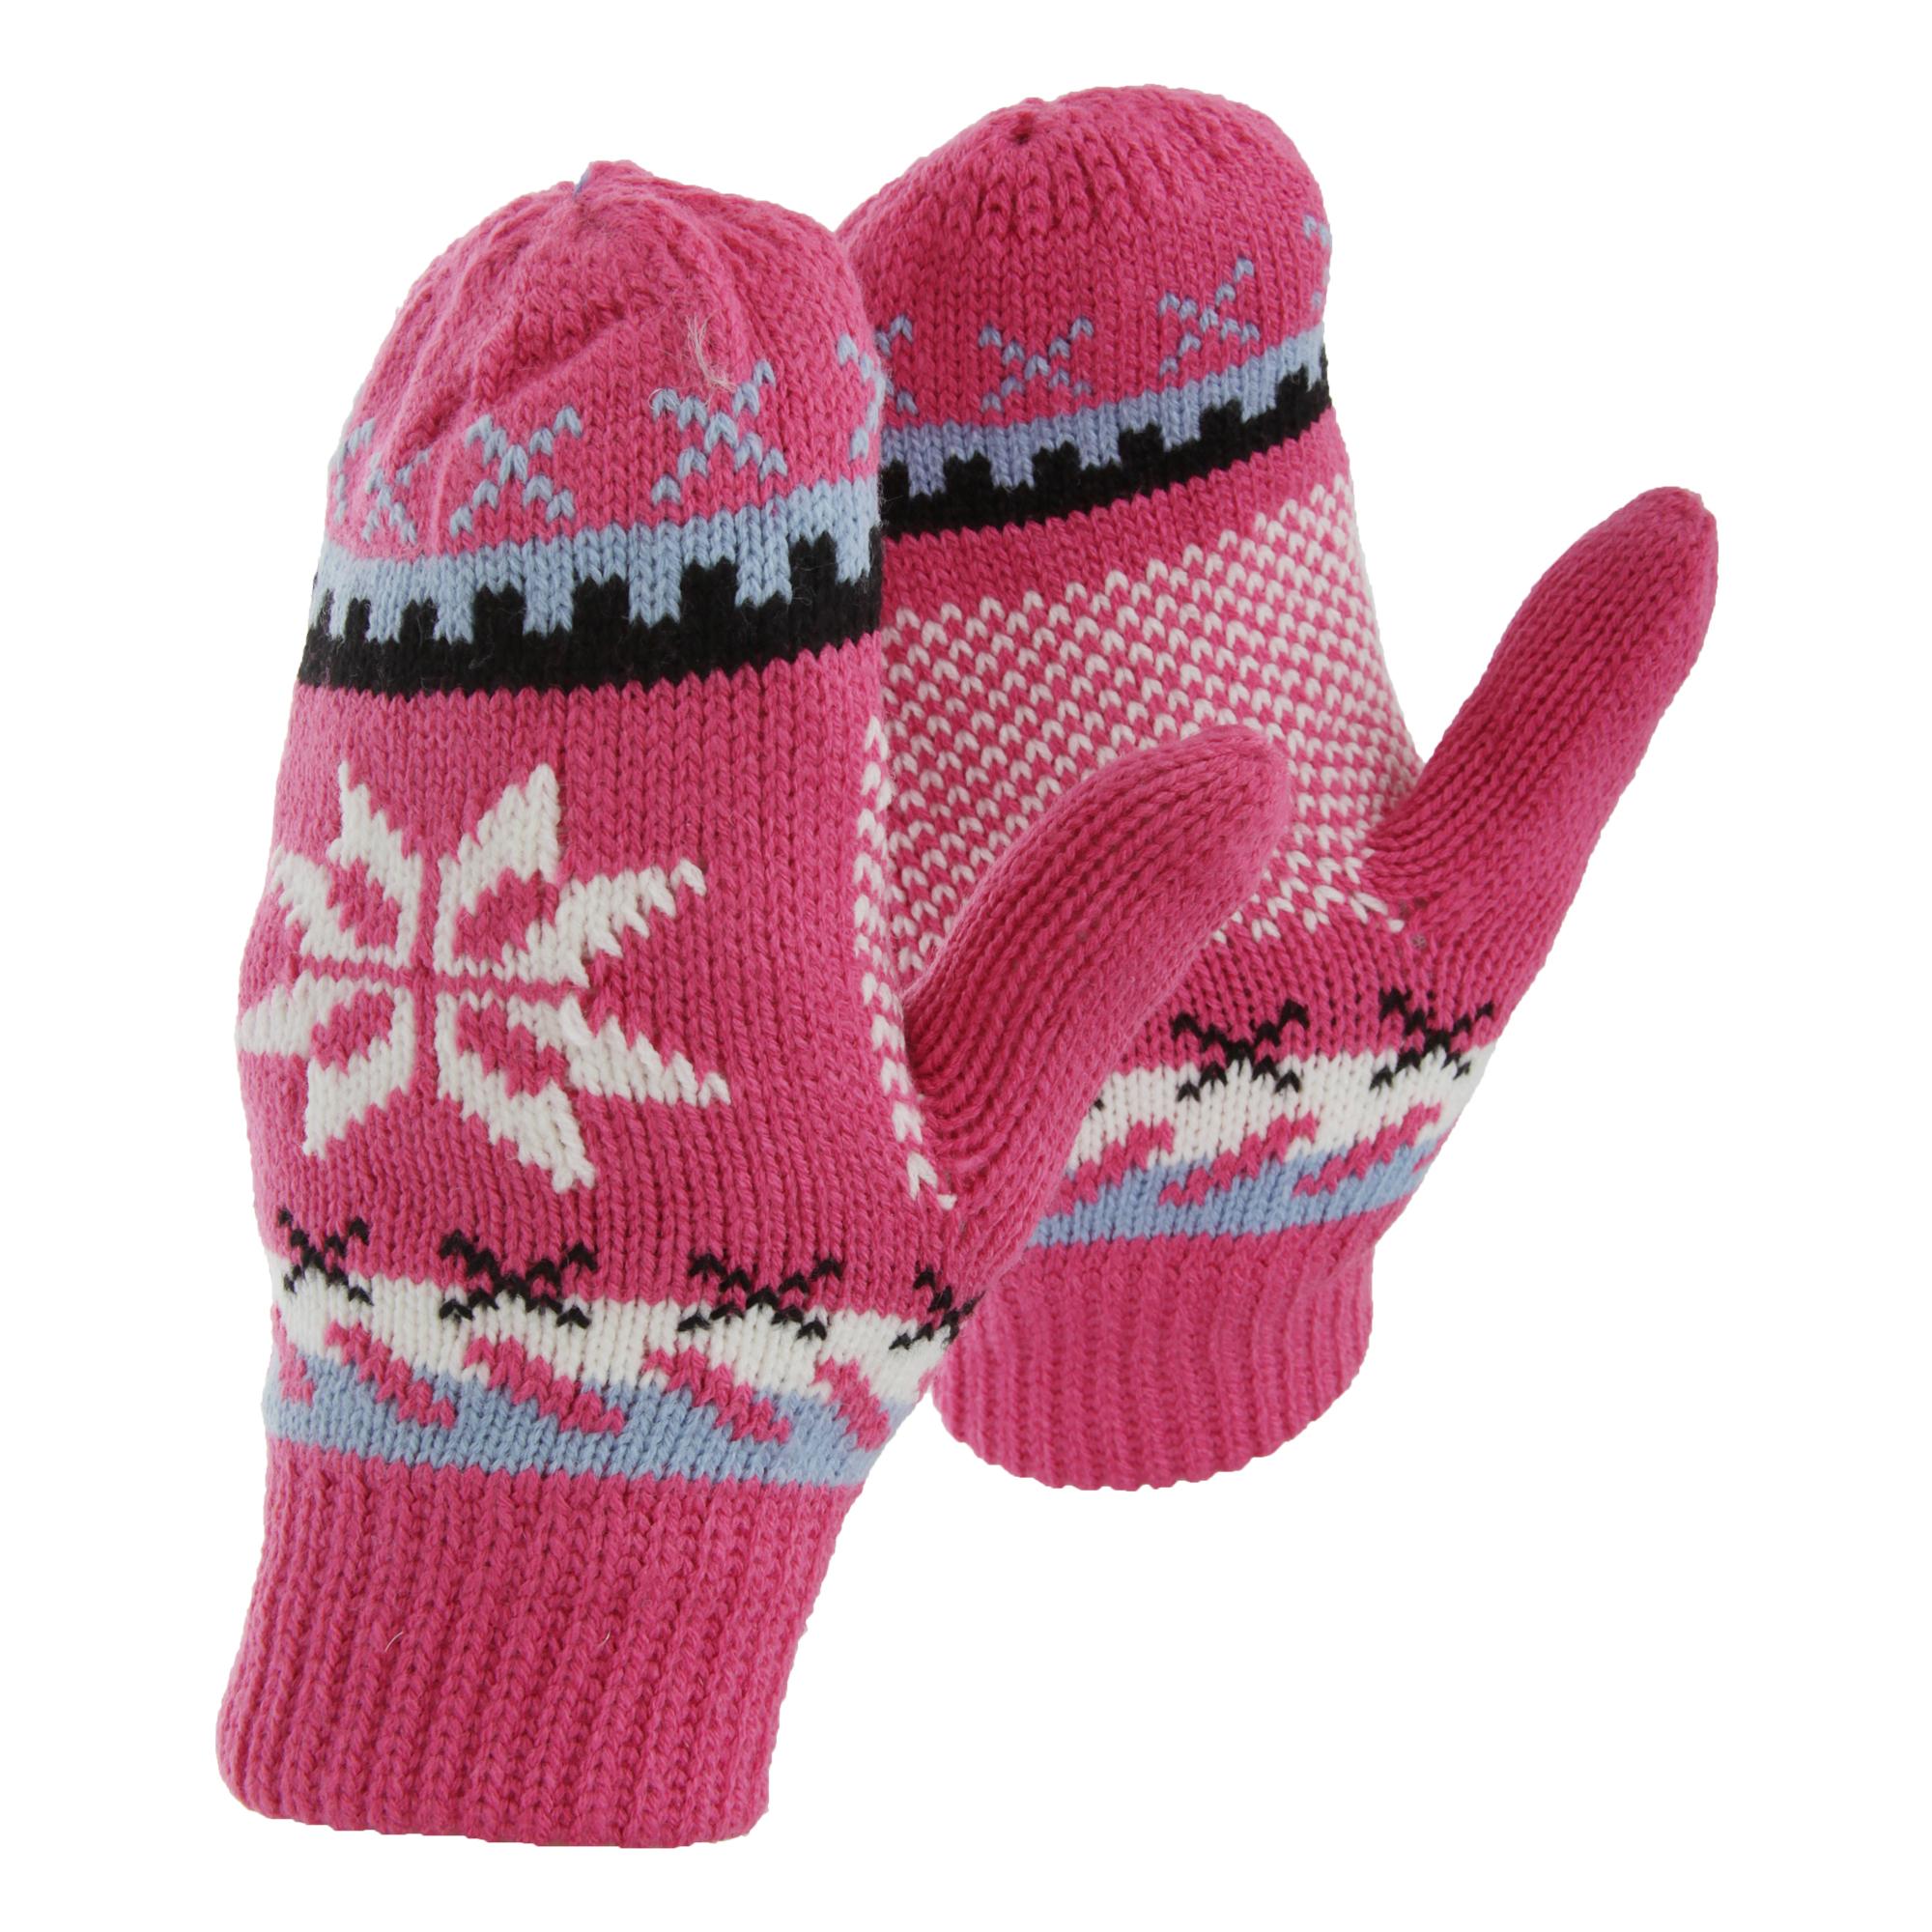 Womens/Ladies Fairisle Snowflake Design Winter Mittens ...